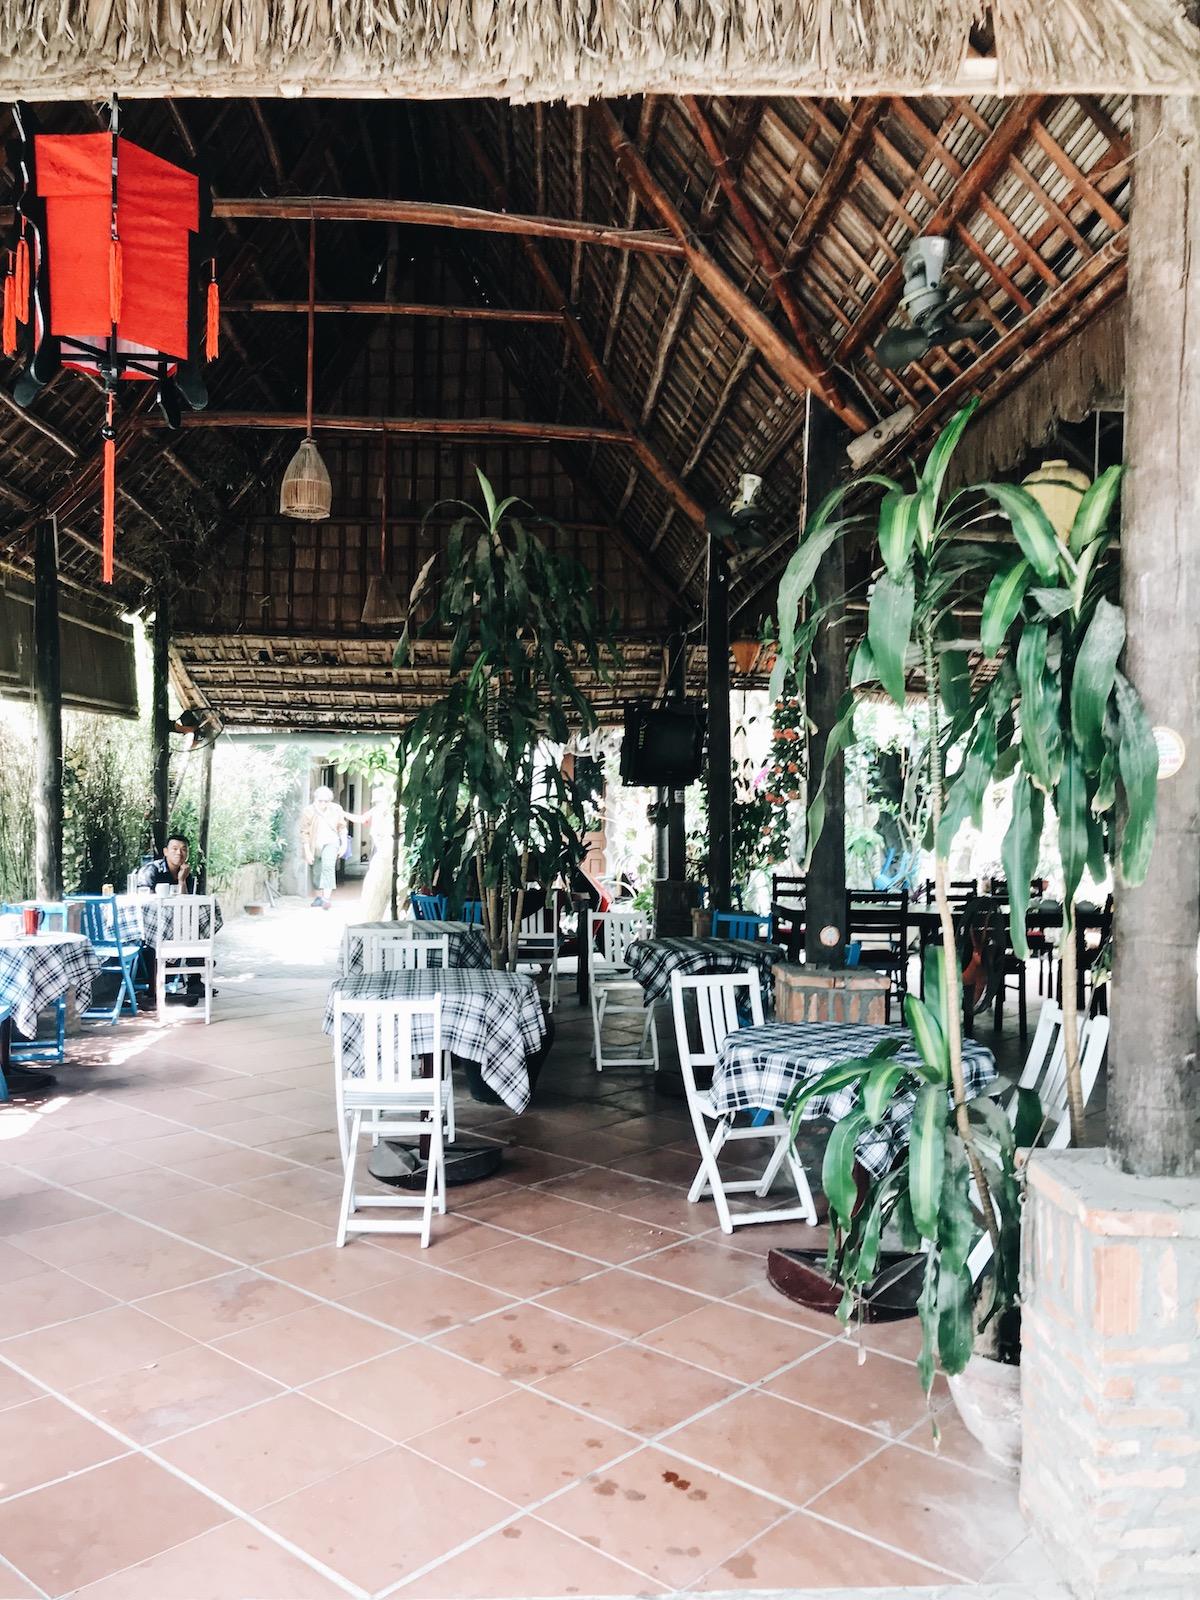 The Mountain Cafe, Hoi An, Vietnam